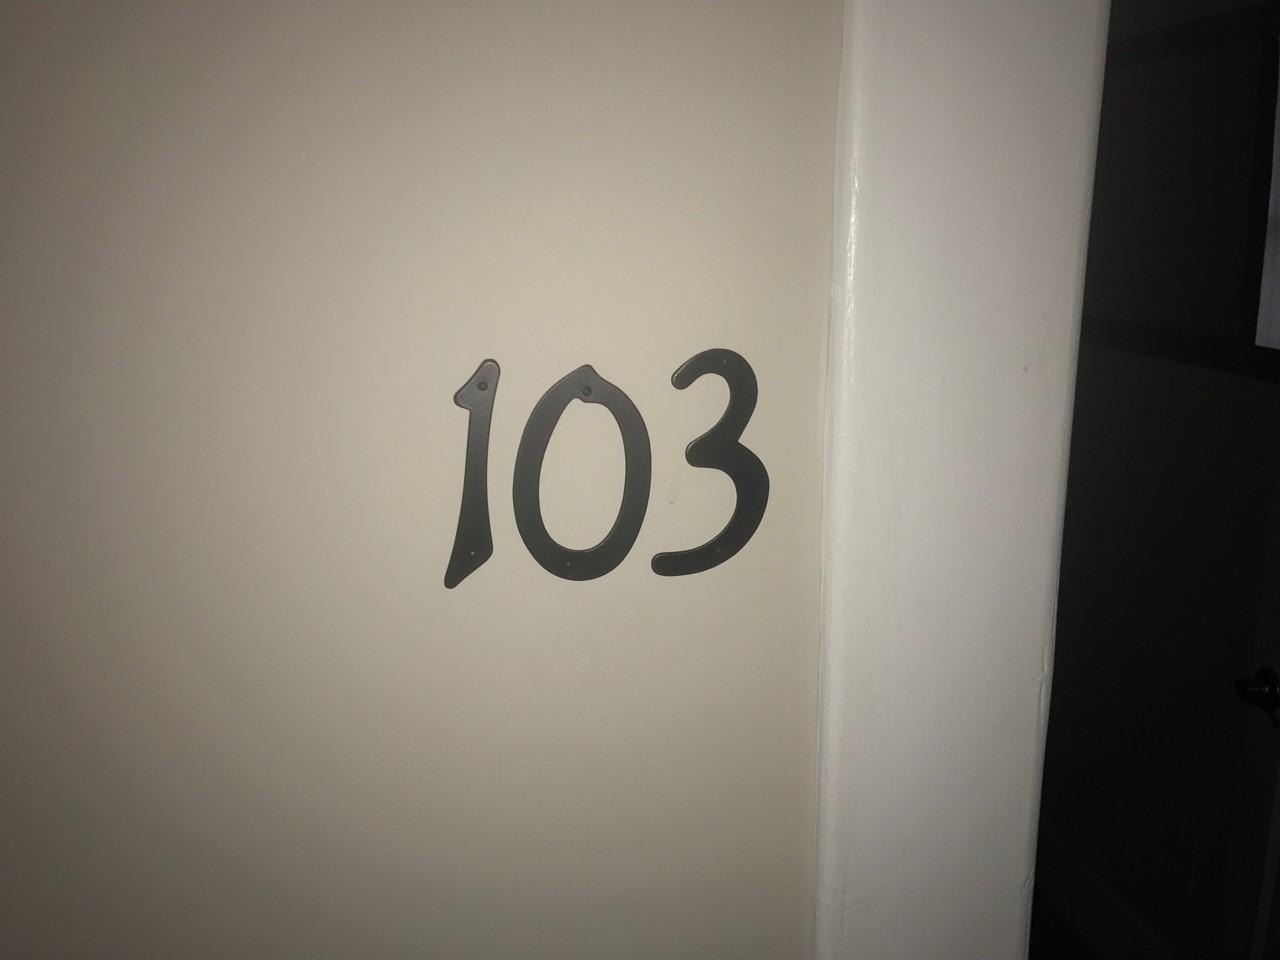 IMAL Room 103 1